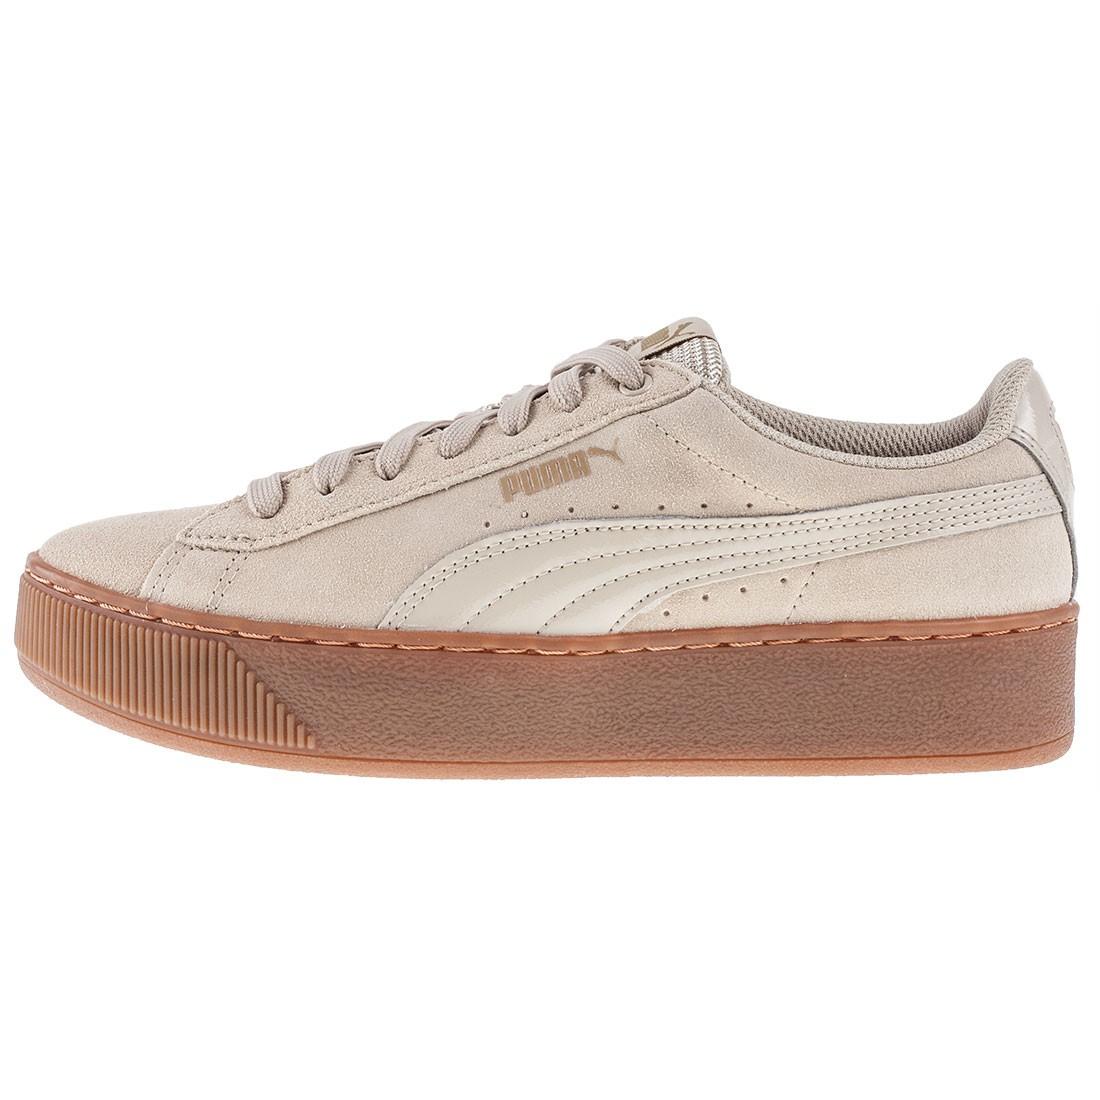 PUMA Vikky Platform Leather Sneaker Scarpe Donna 363287 14 Beige